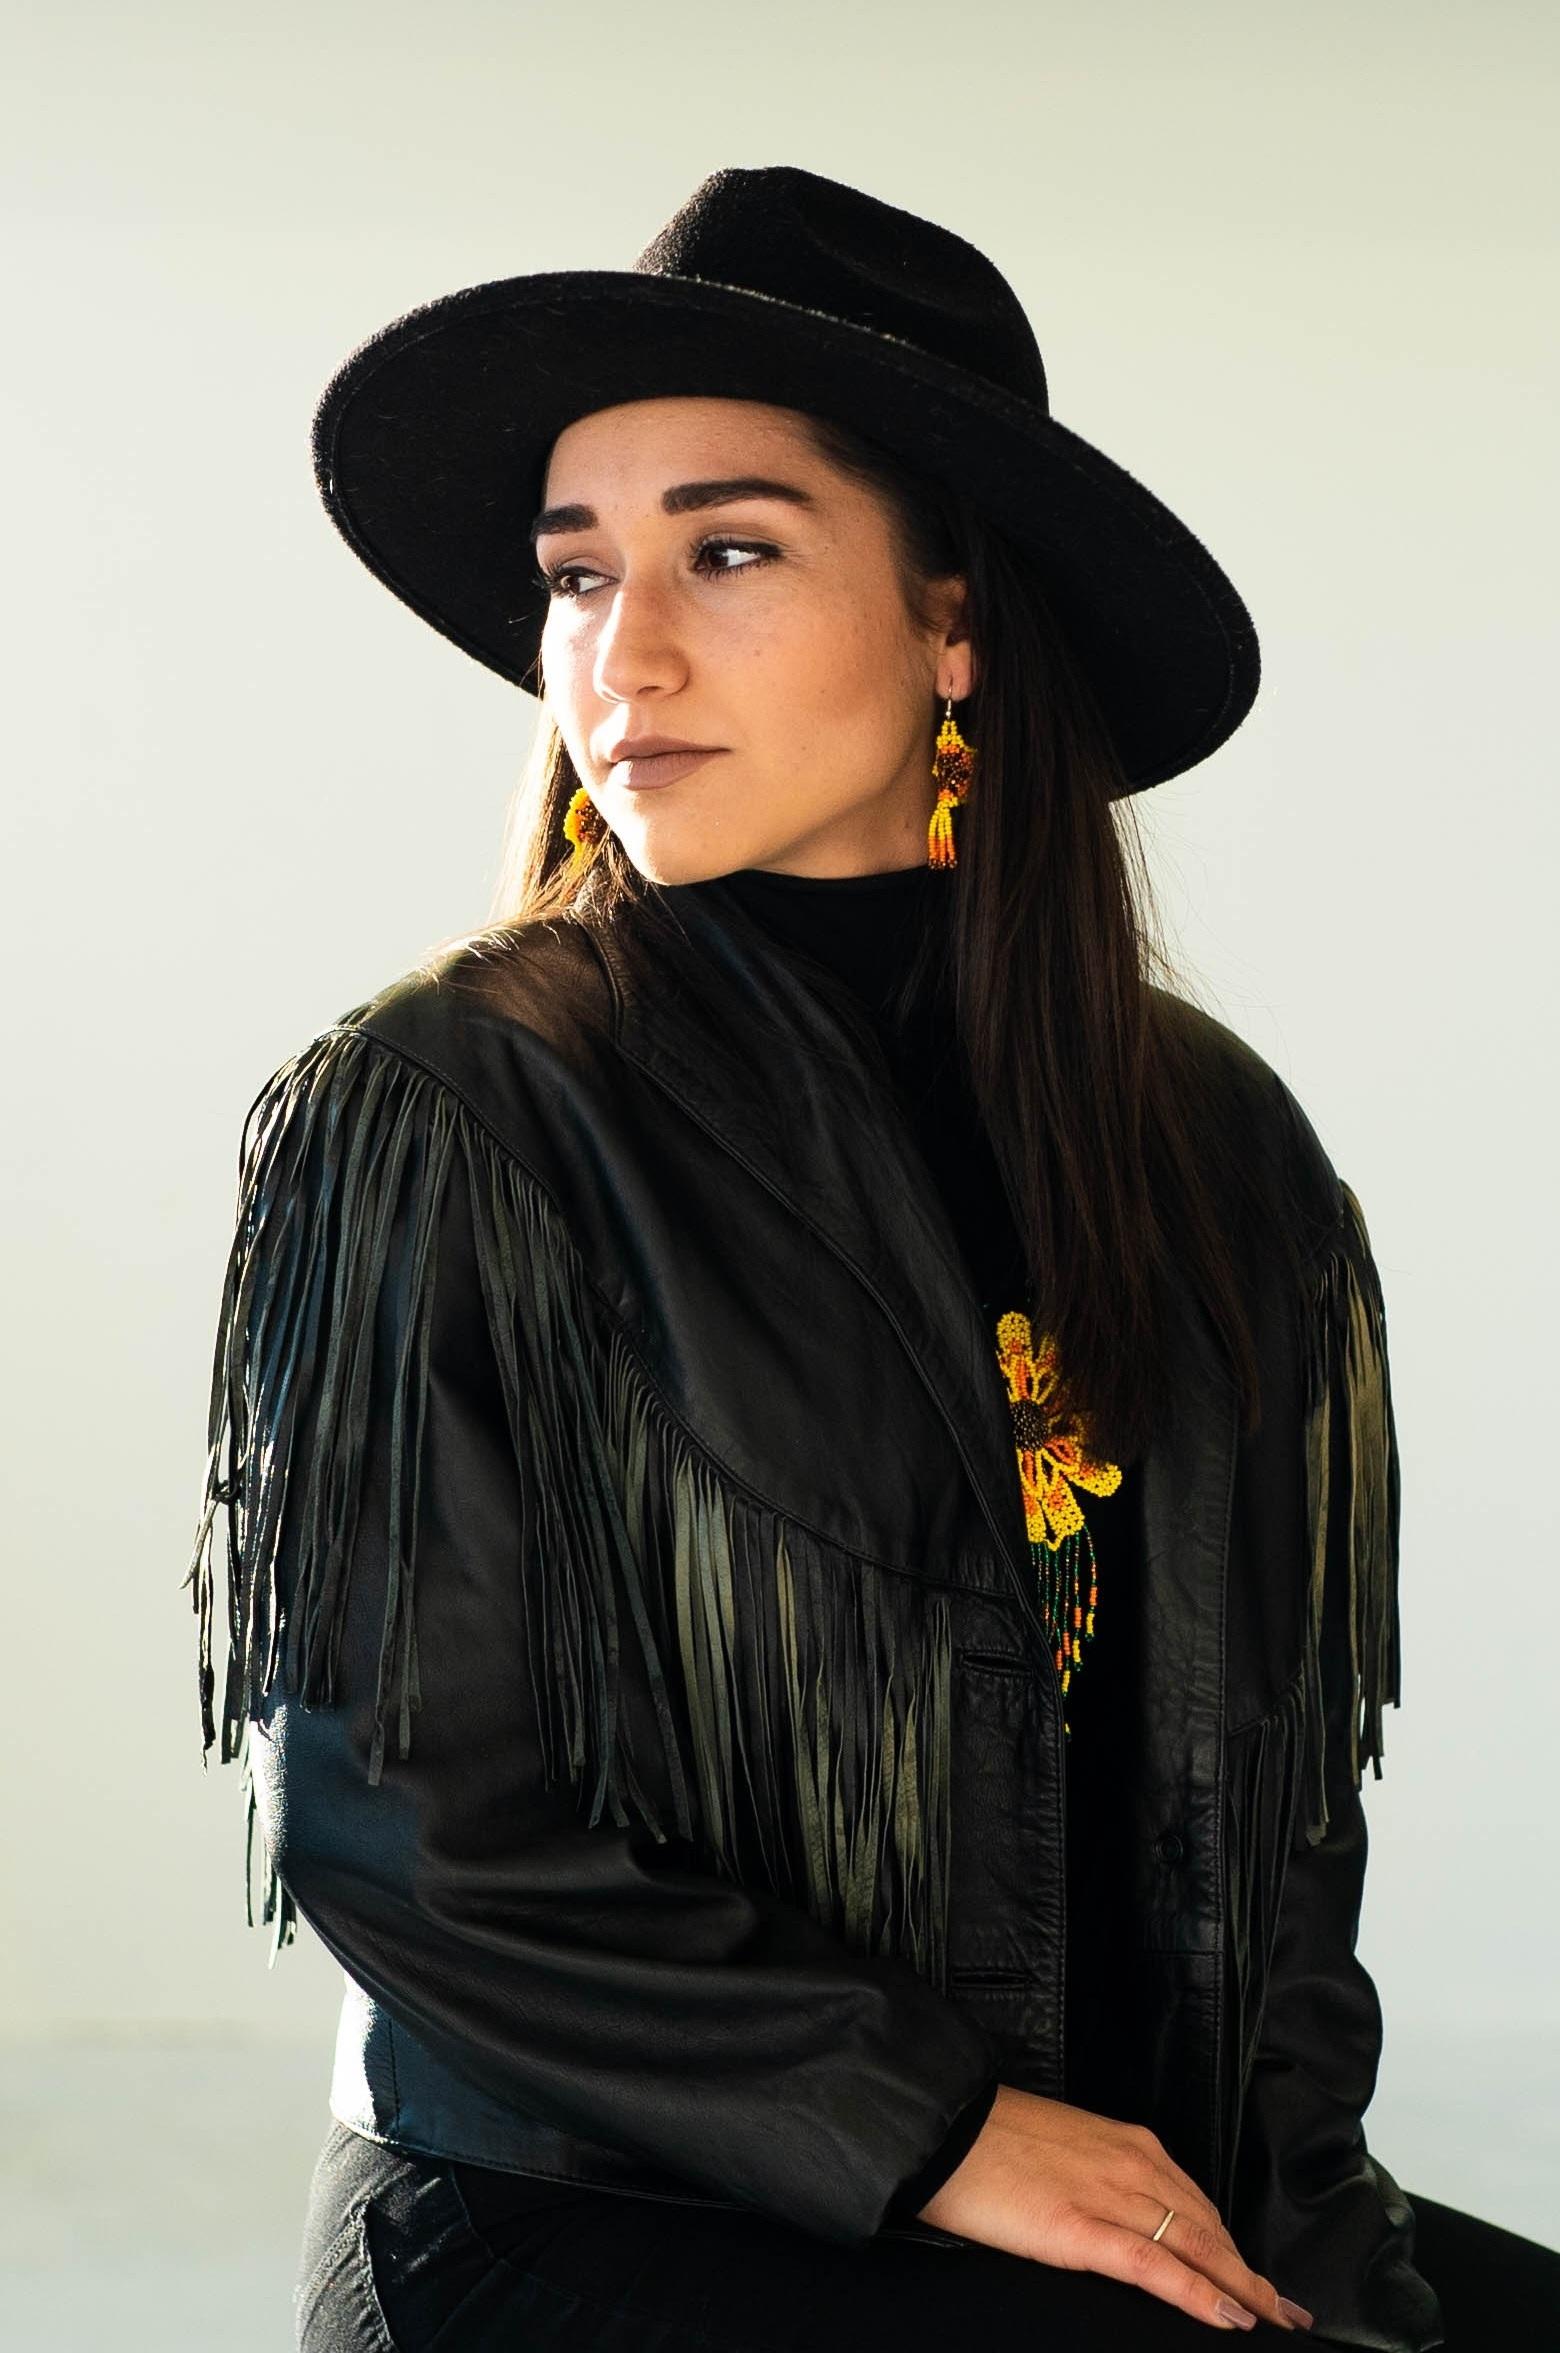 Alexis Saenz - Dancer | Choreographer | Instructor | Creative Director